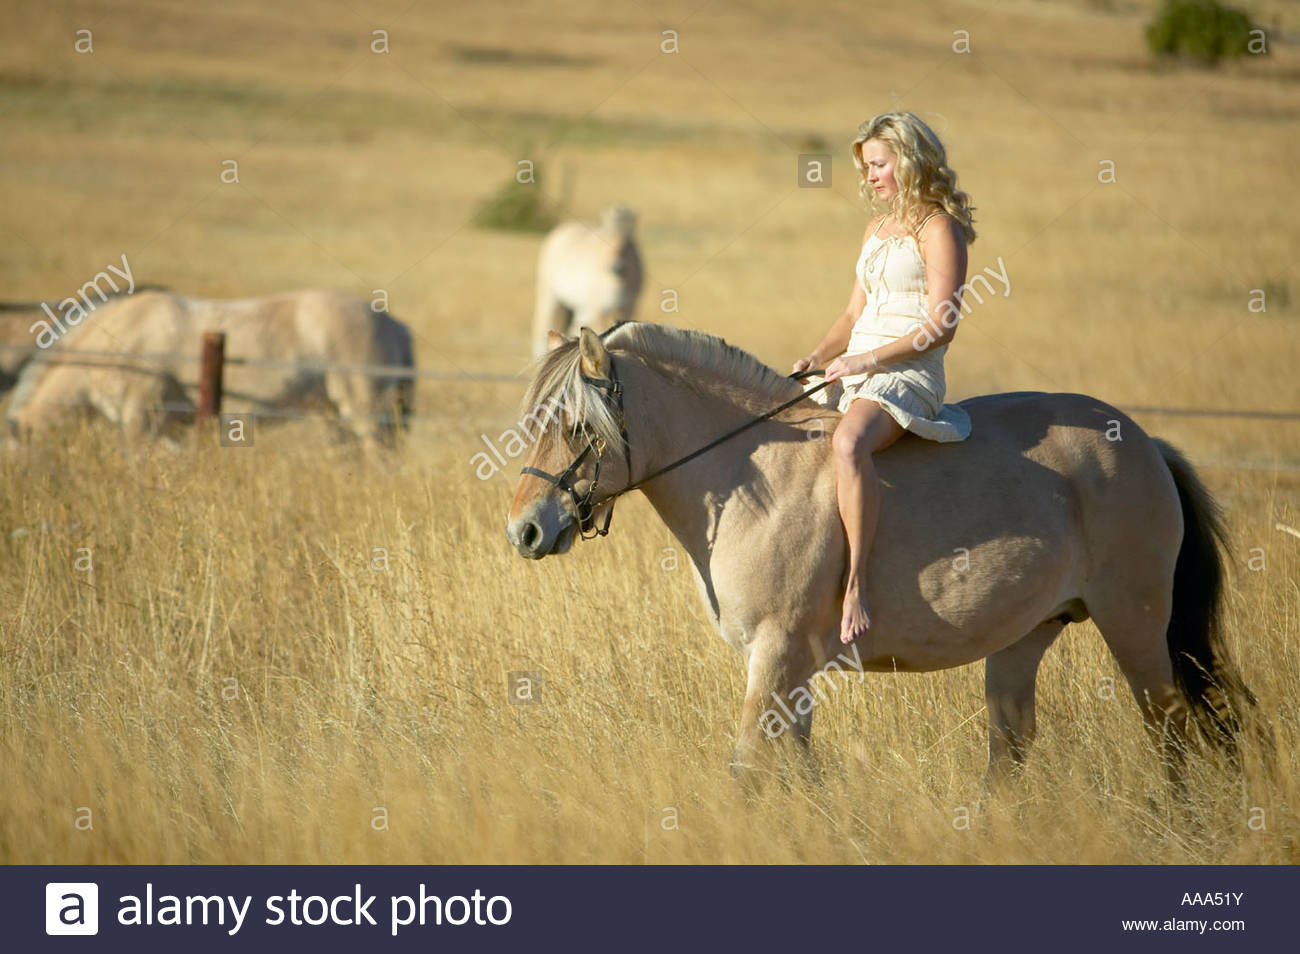 Woman riding a horse bareback Stock Photo: 12564518 - Alamy